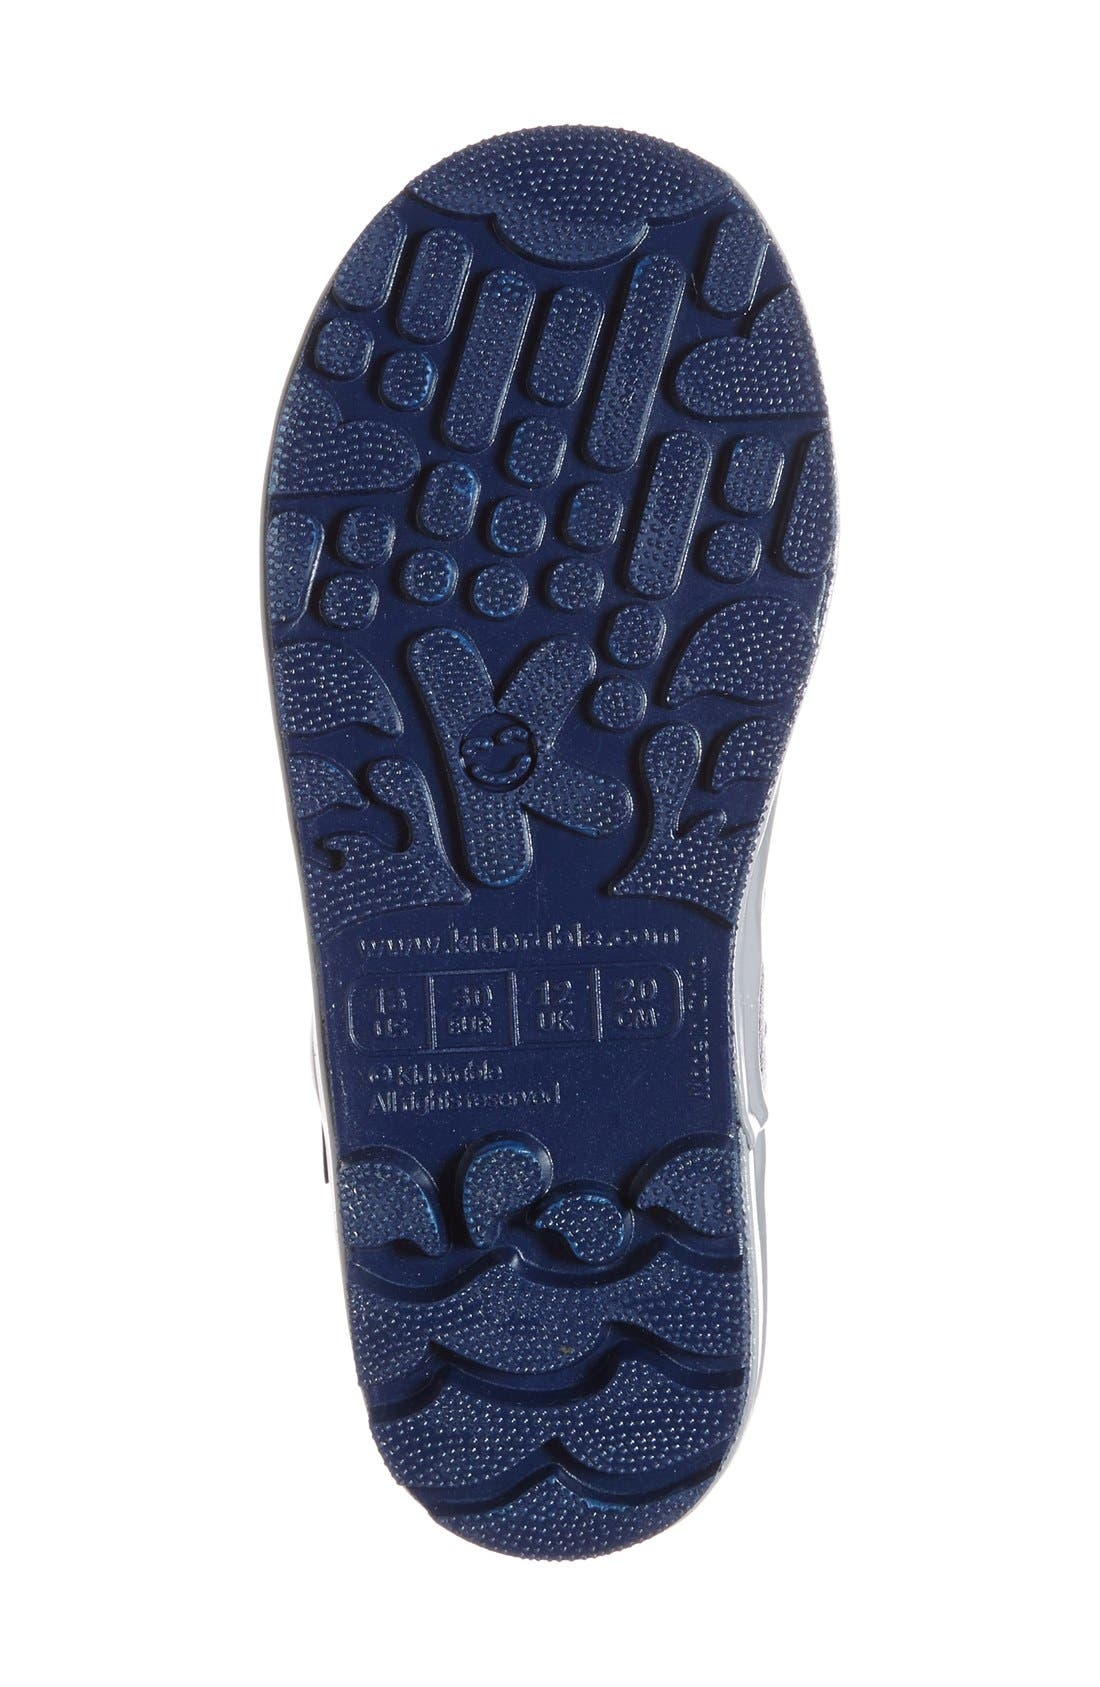 'Space Hero' Waterproof Rain Boot,                             Alternate thumbnail 4, color,                             Blue